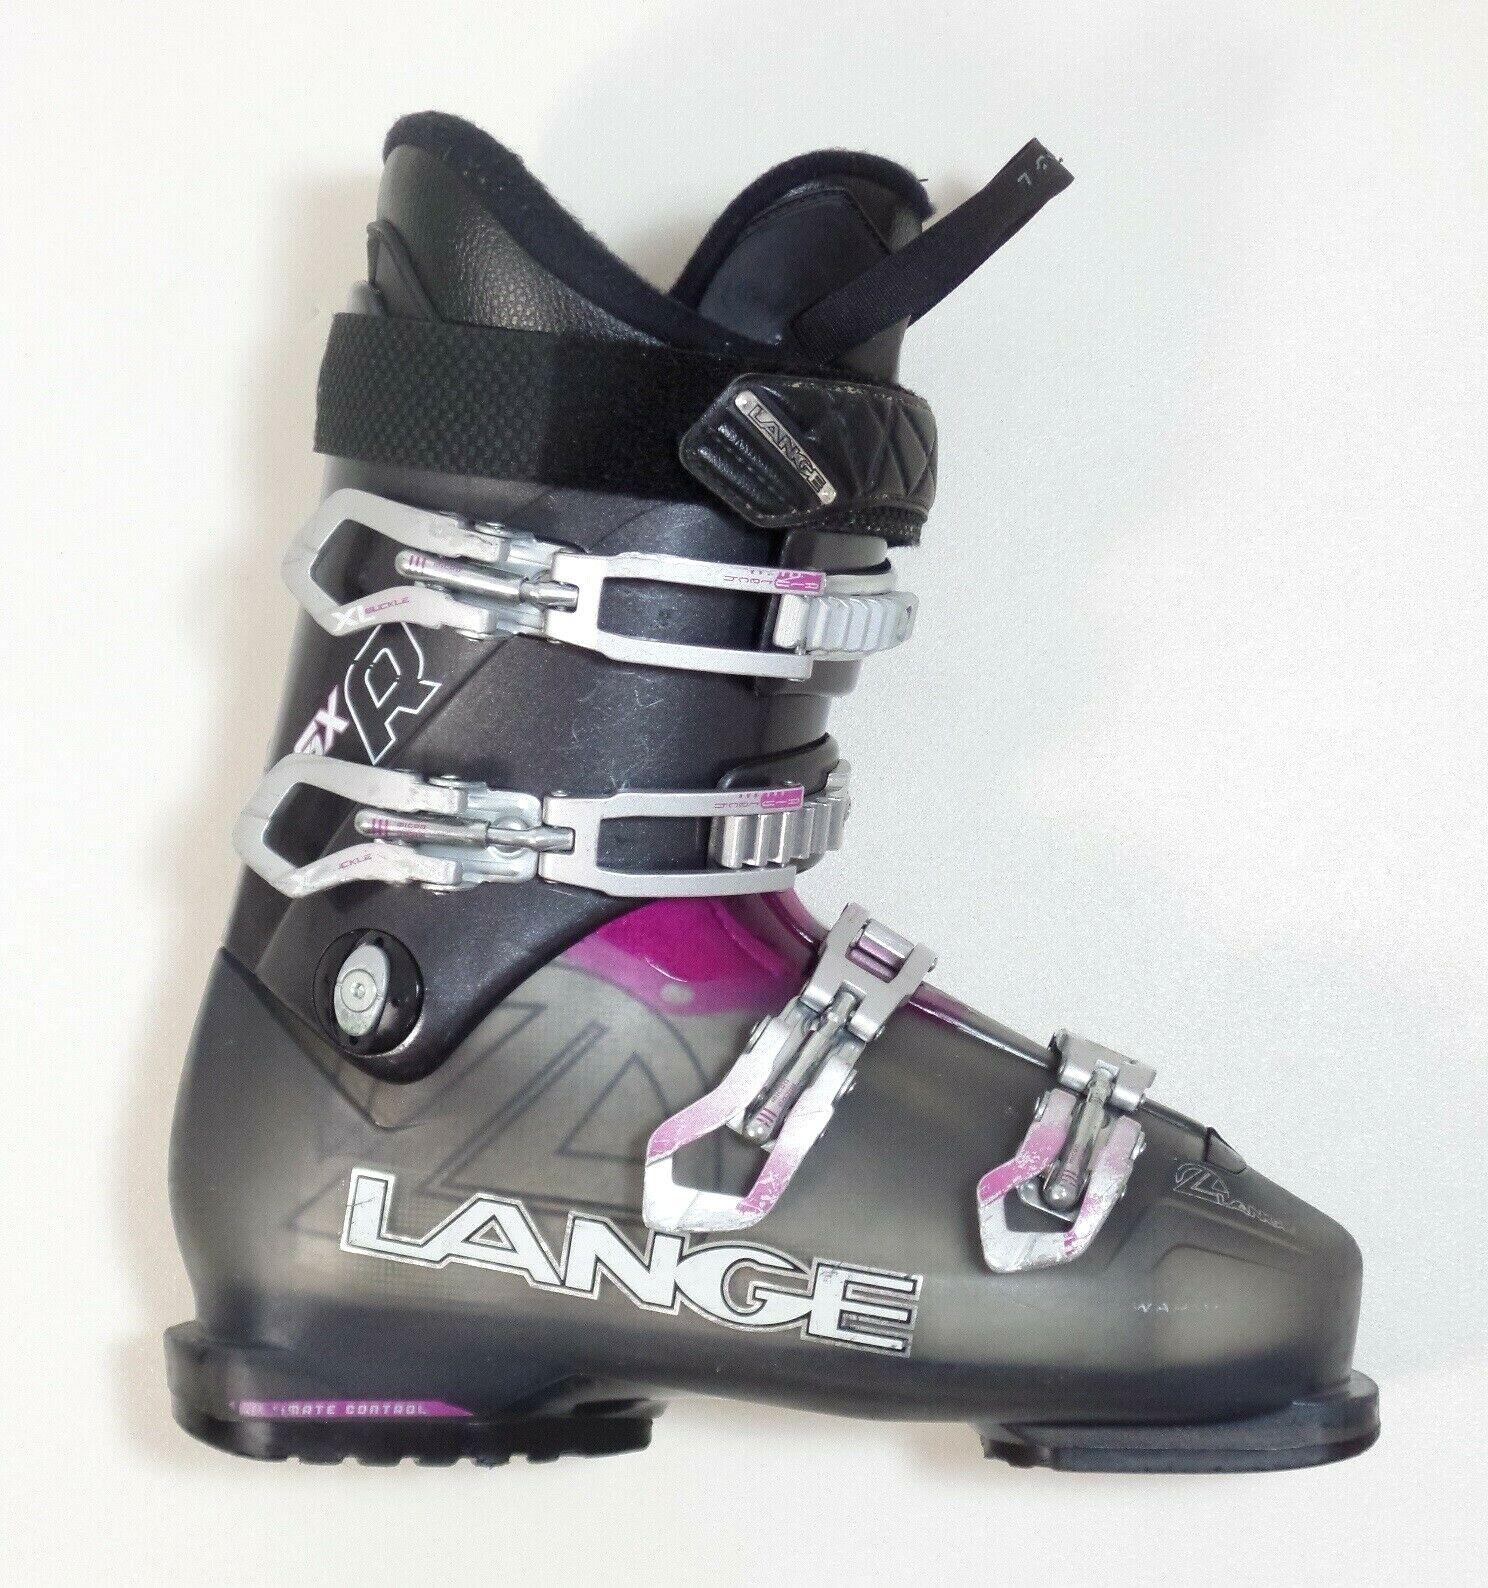 Lange SX R Damern Skischuhe FLEX 80 circa Gr. 40,5   MP 26 Ski Schuhe (PN352)